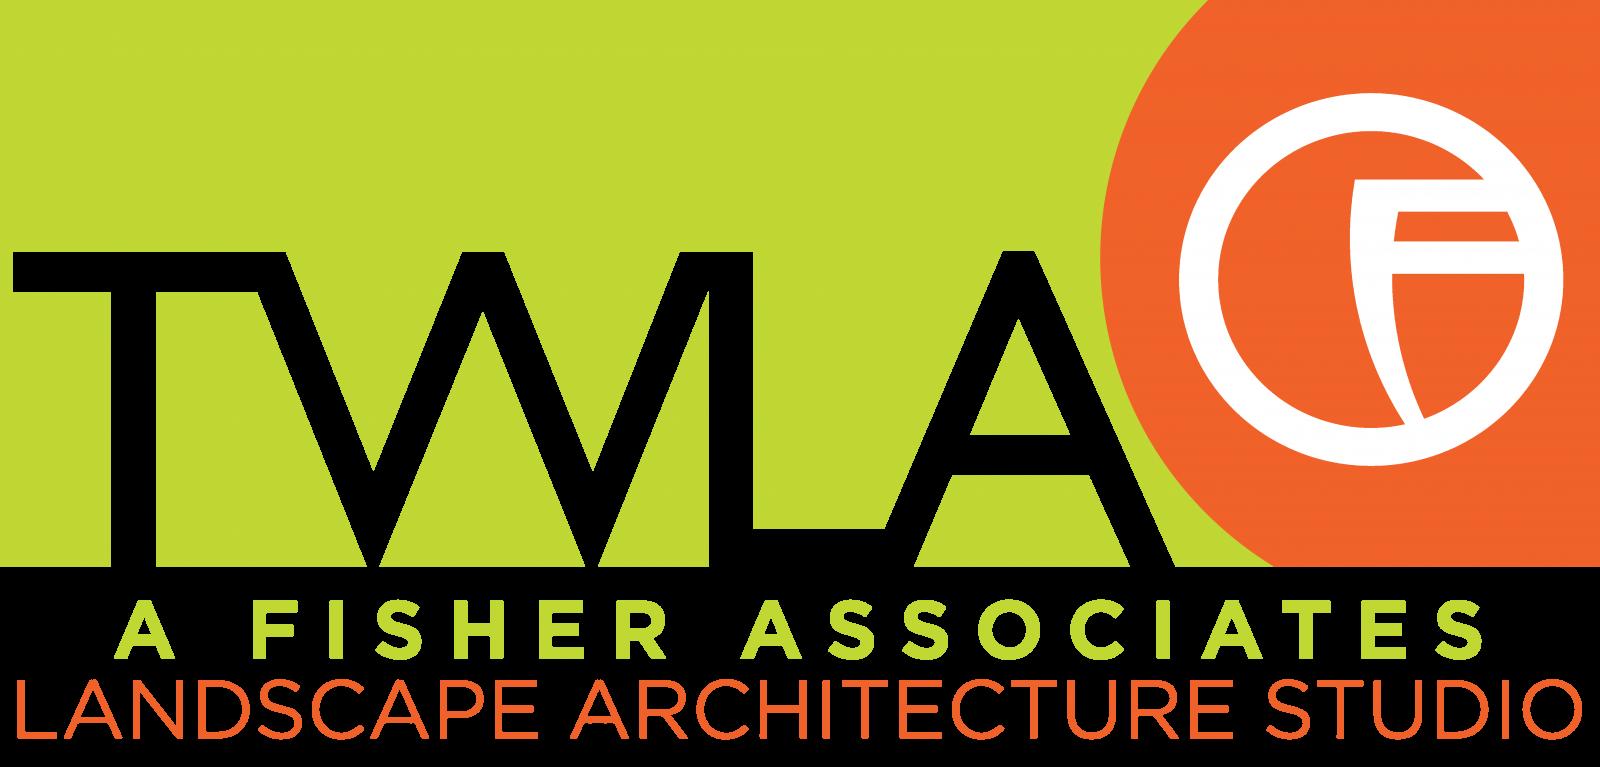 TWMLA Logo Final Transparent 01 2